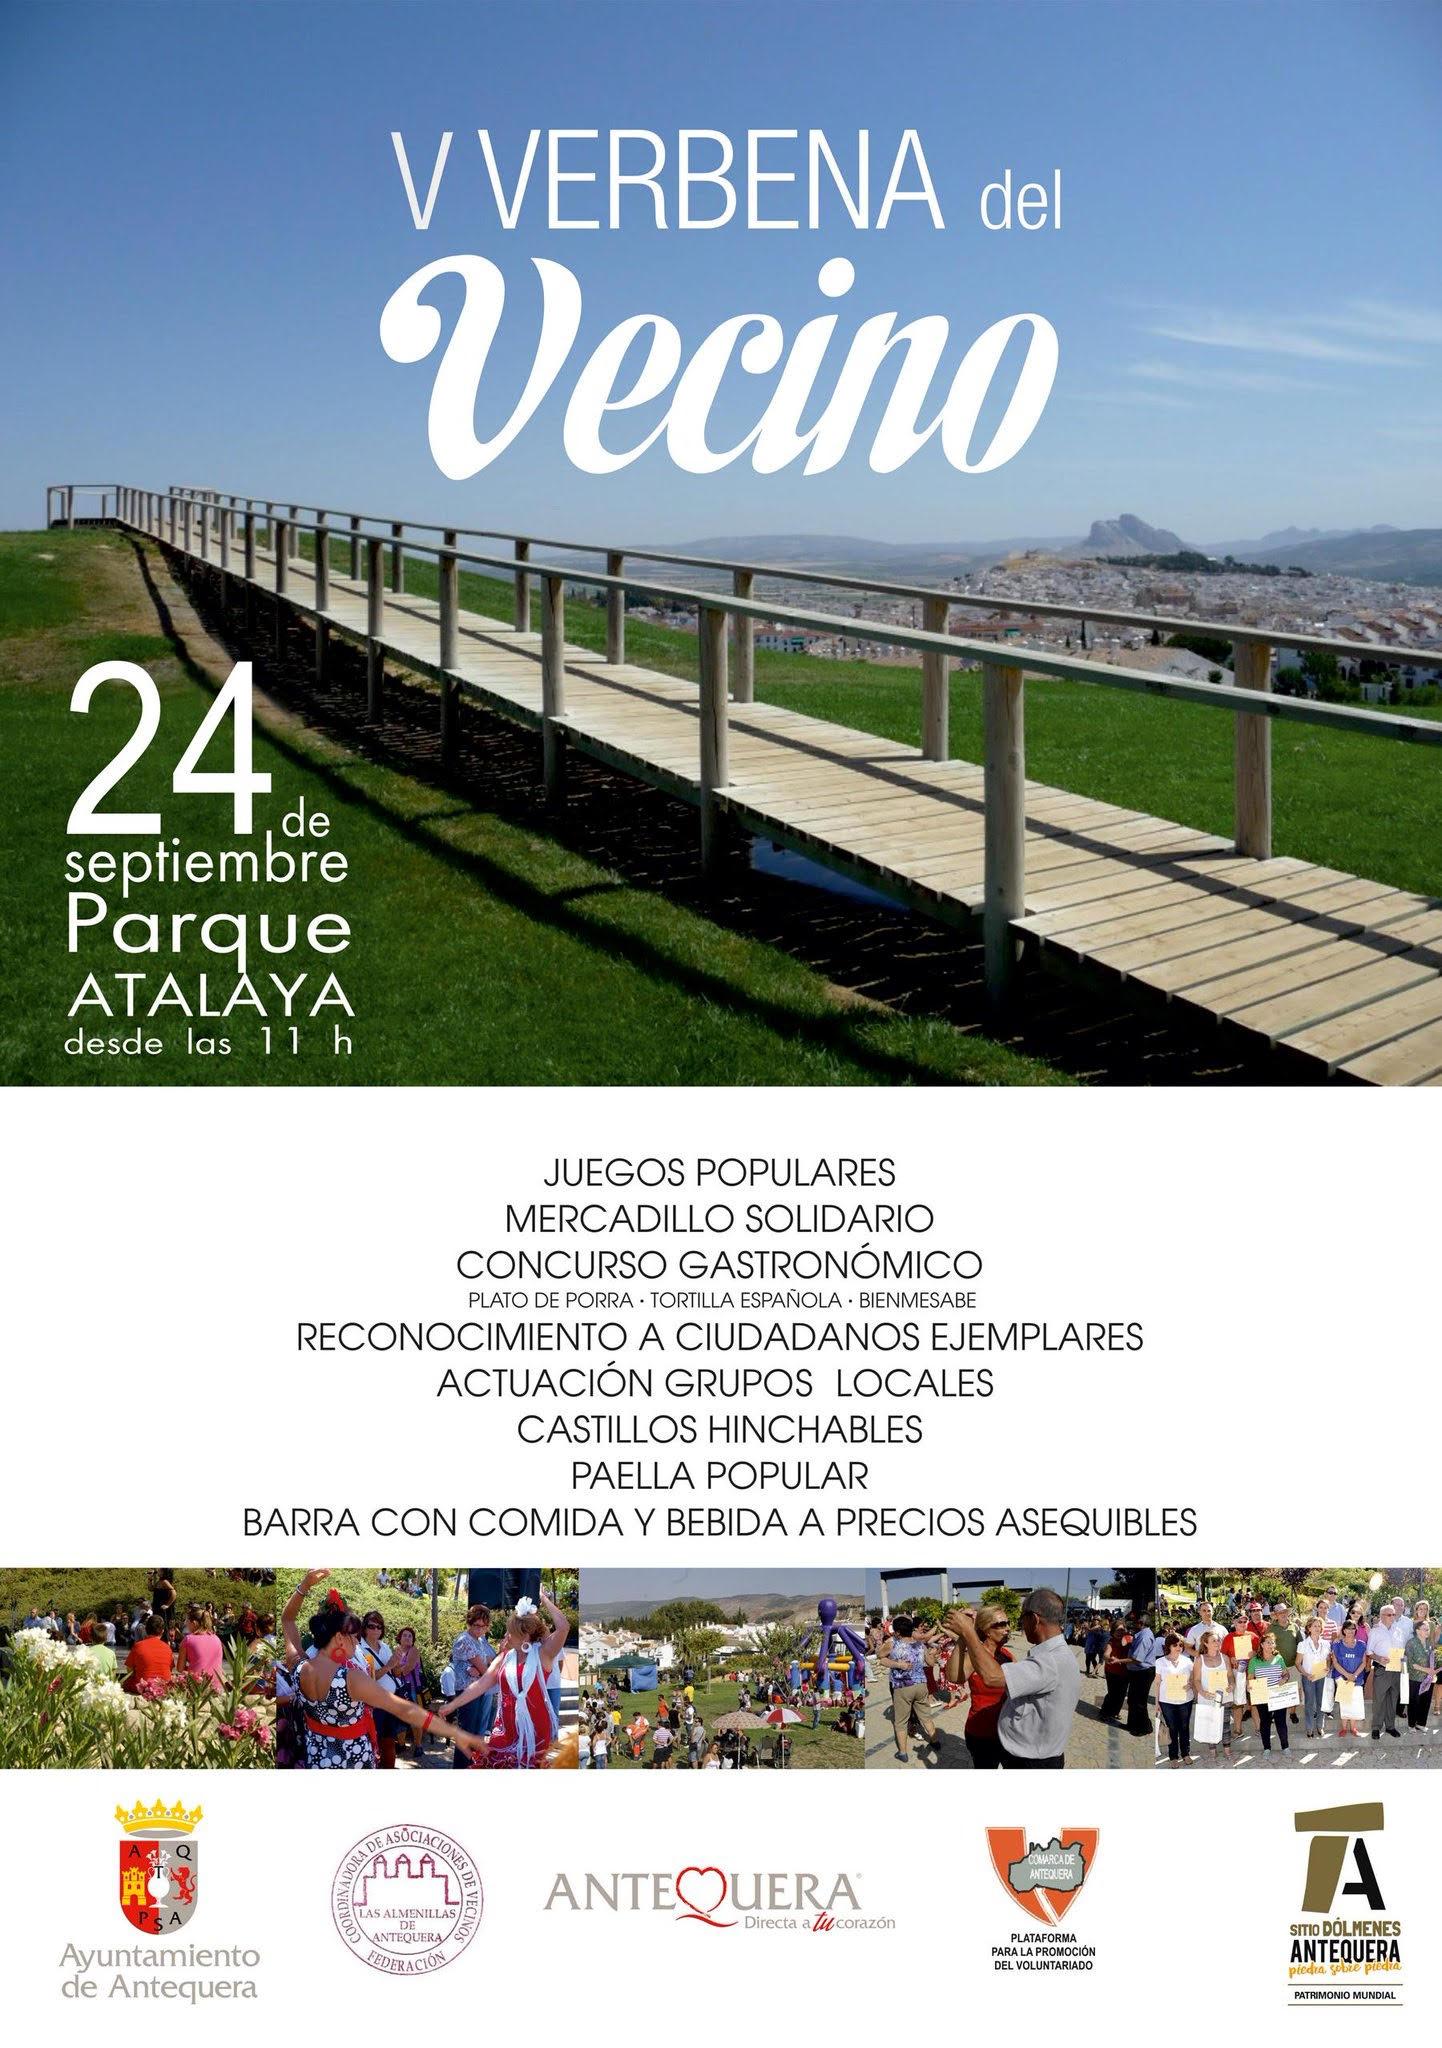 V Verbena del Vecino en Antequera (24.sep.2017)